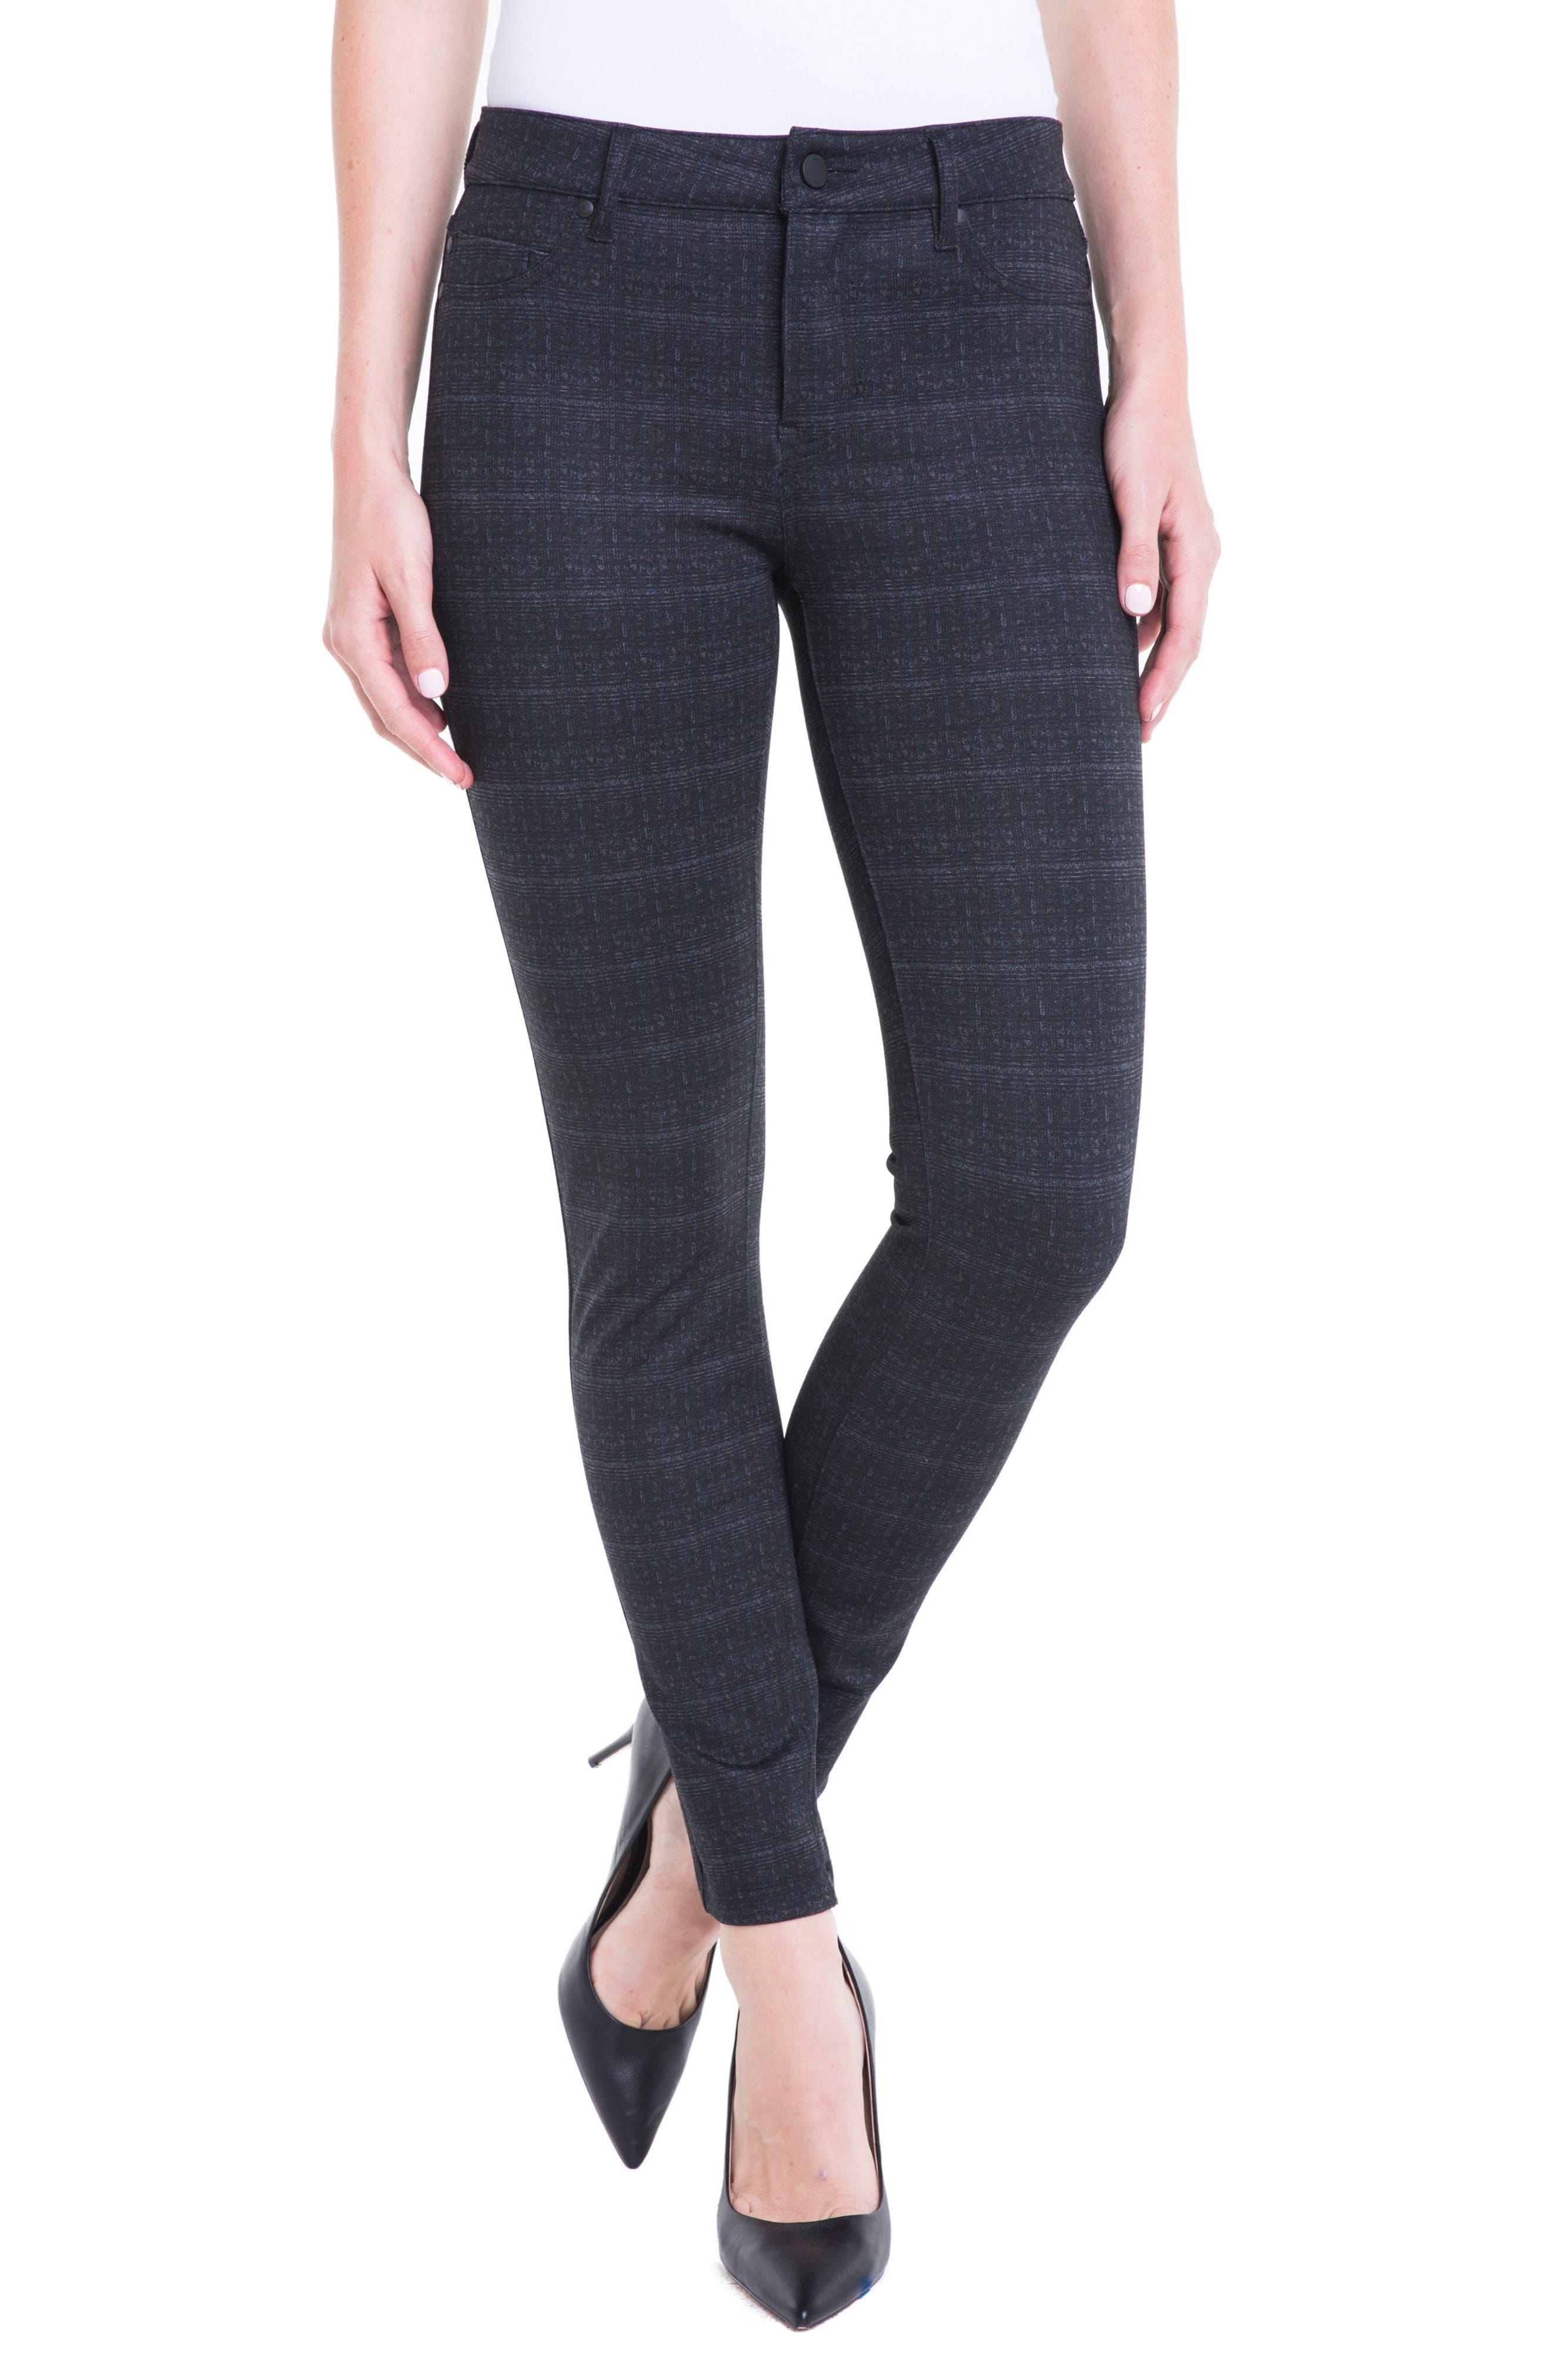 Liverpool Jeans Company Plaid Super Skinny Ponte Knit Pants